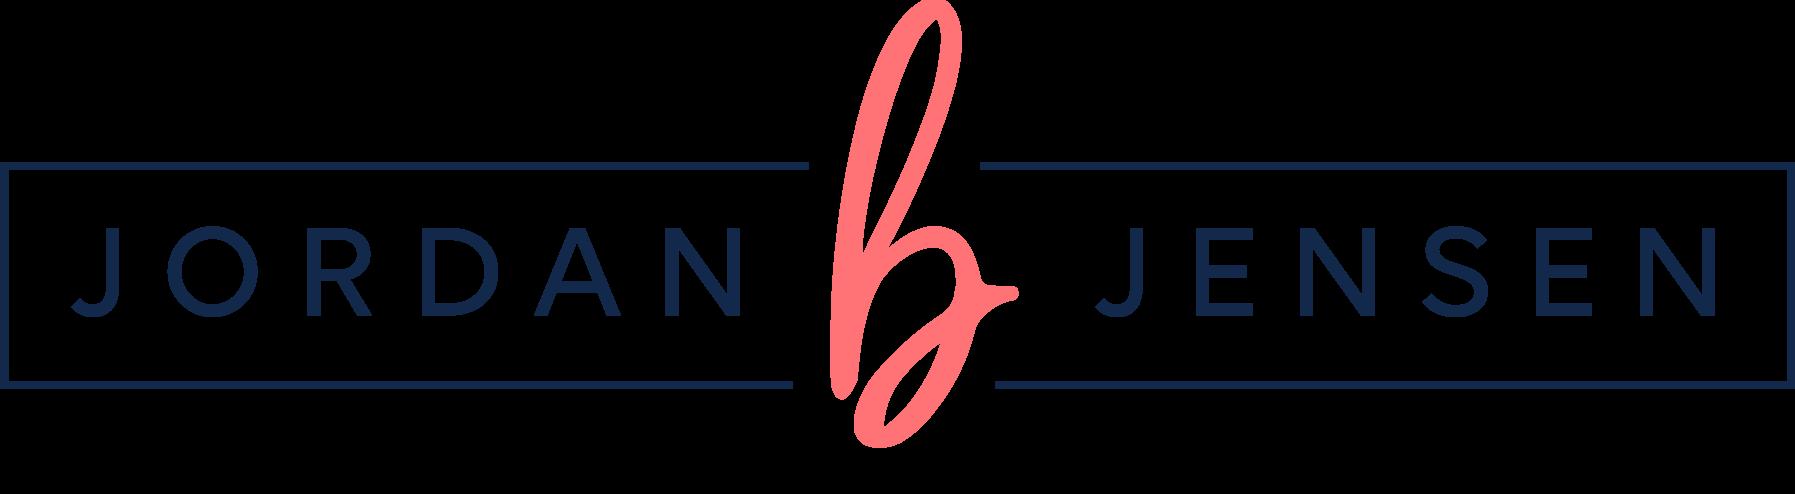 Jordan B. Jensen